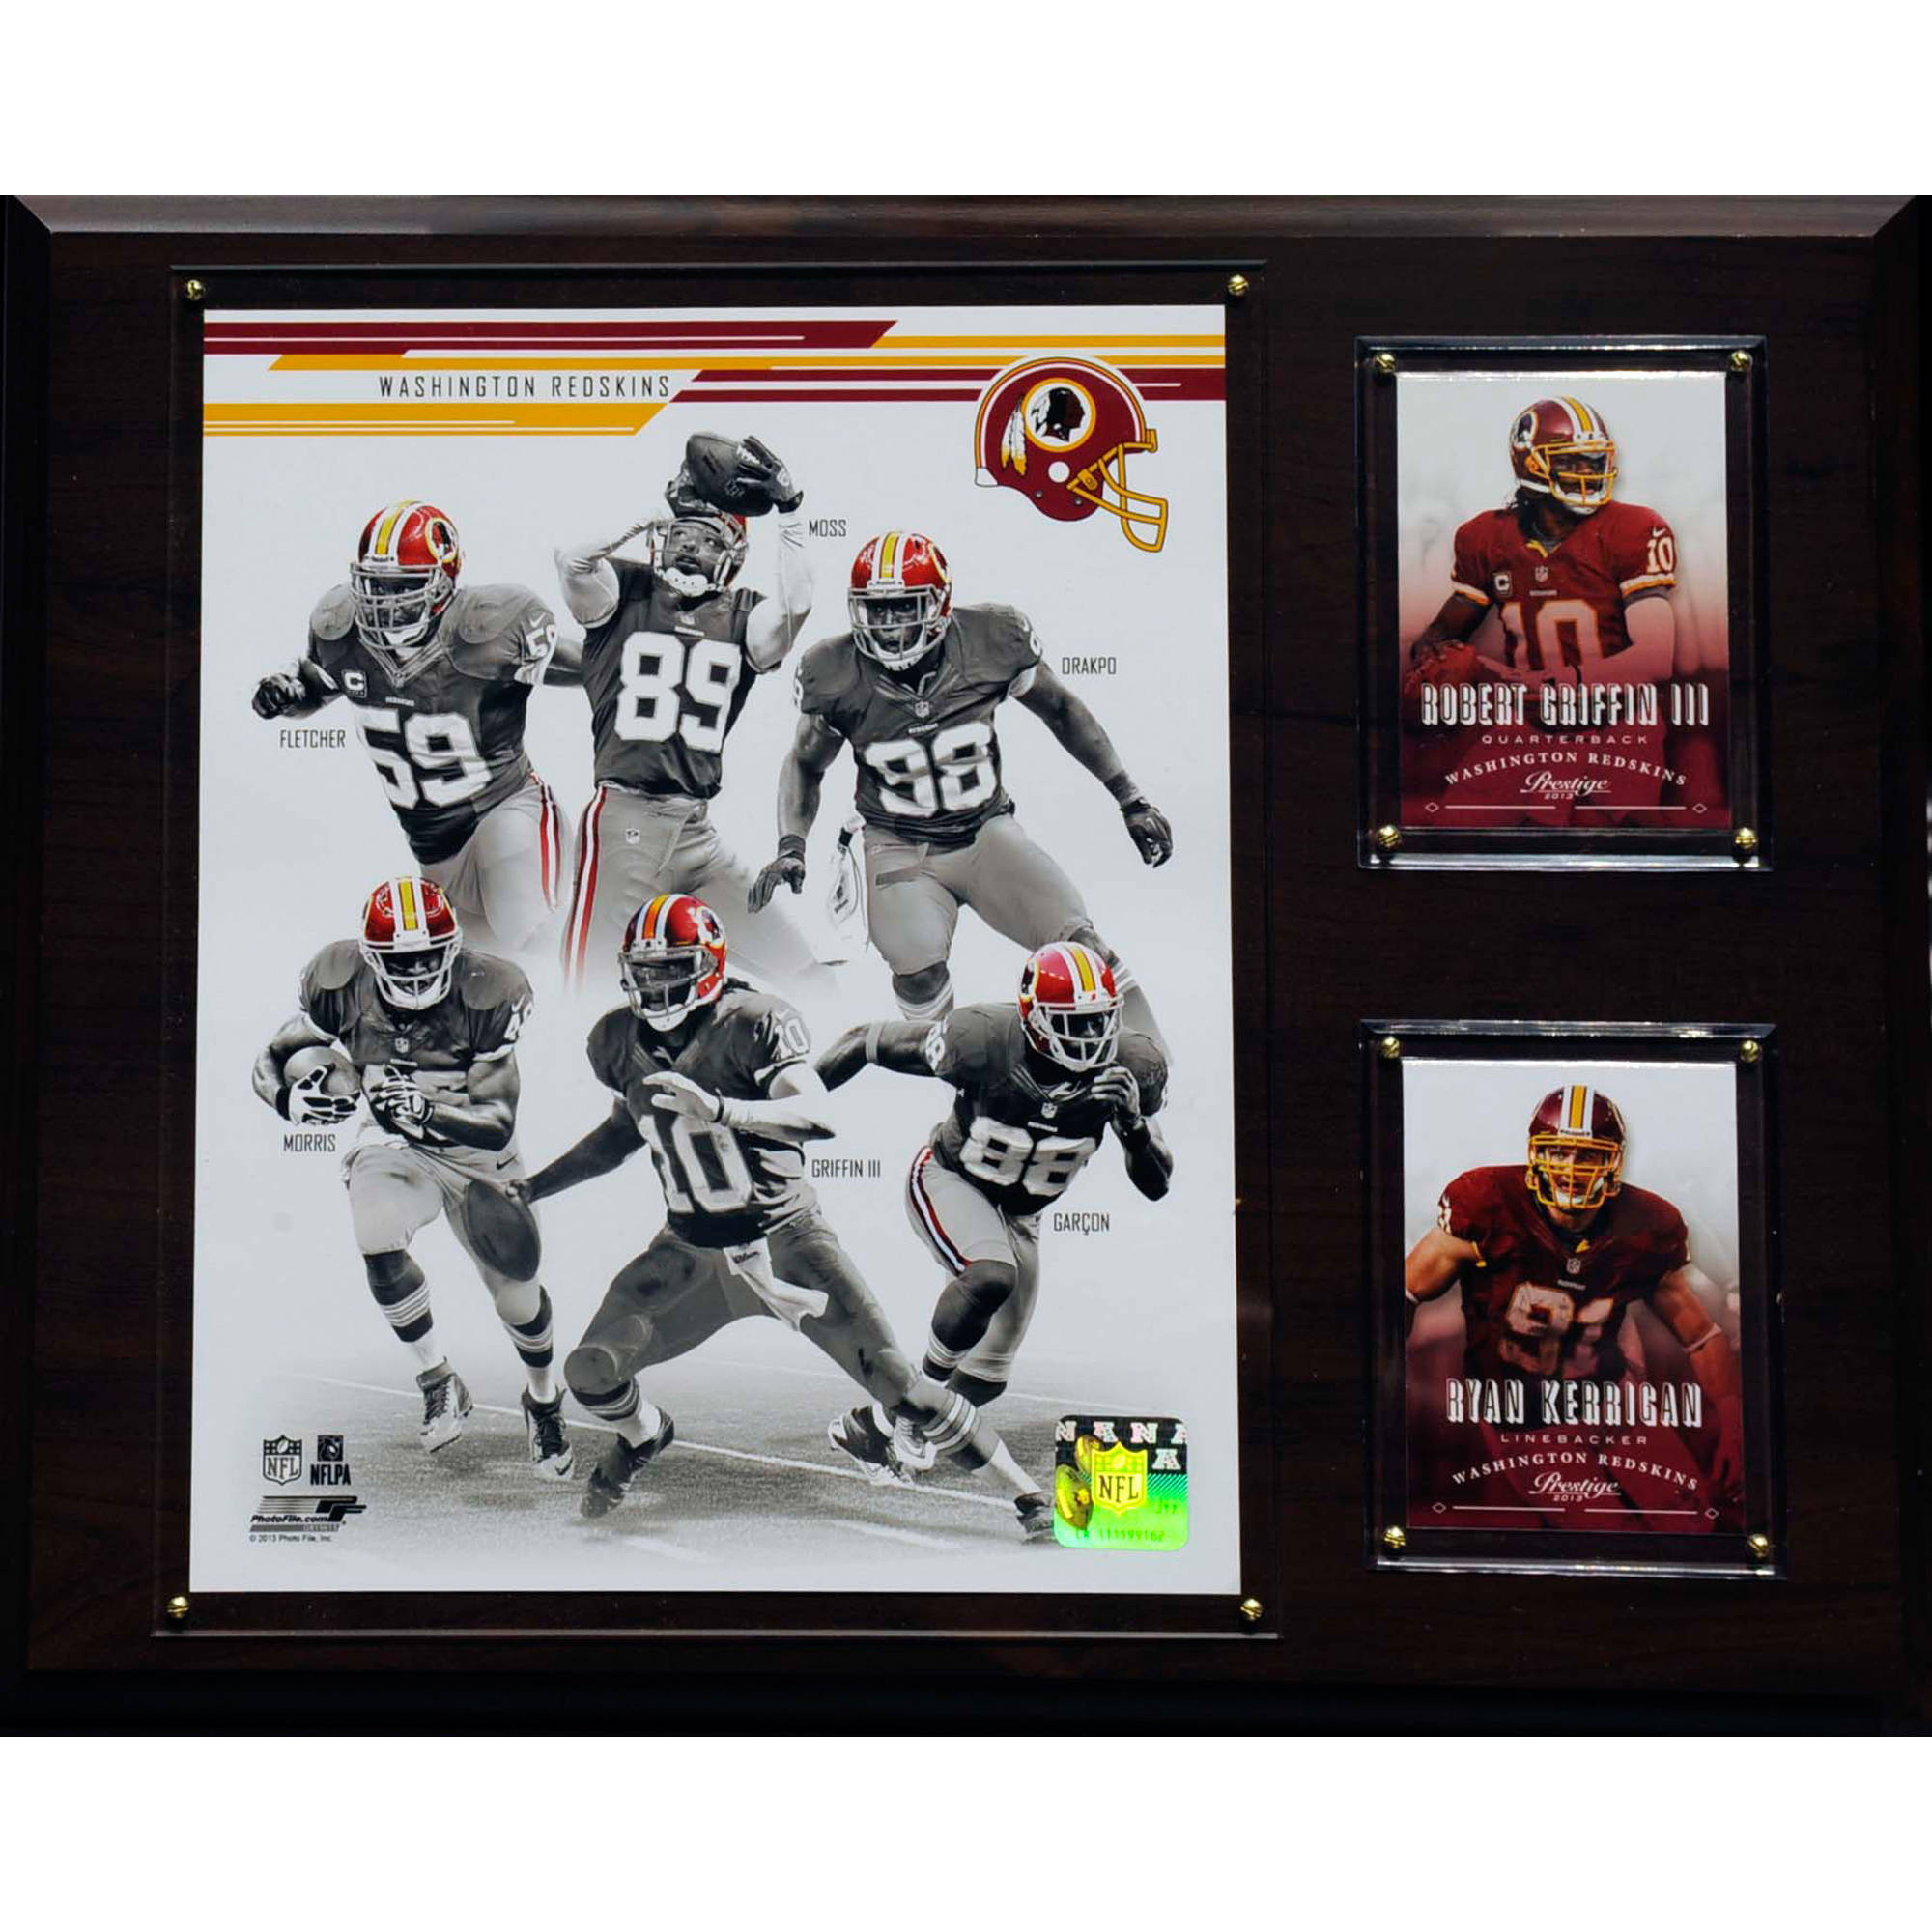 C&I Collectables NFL 12x15 Washington Redskins 2013 Team Plaque